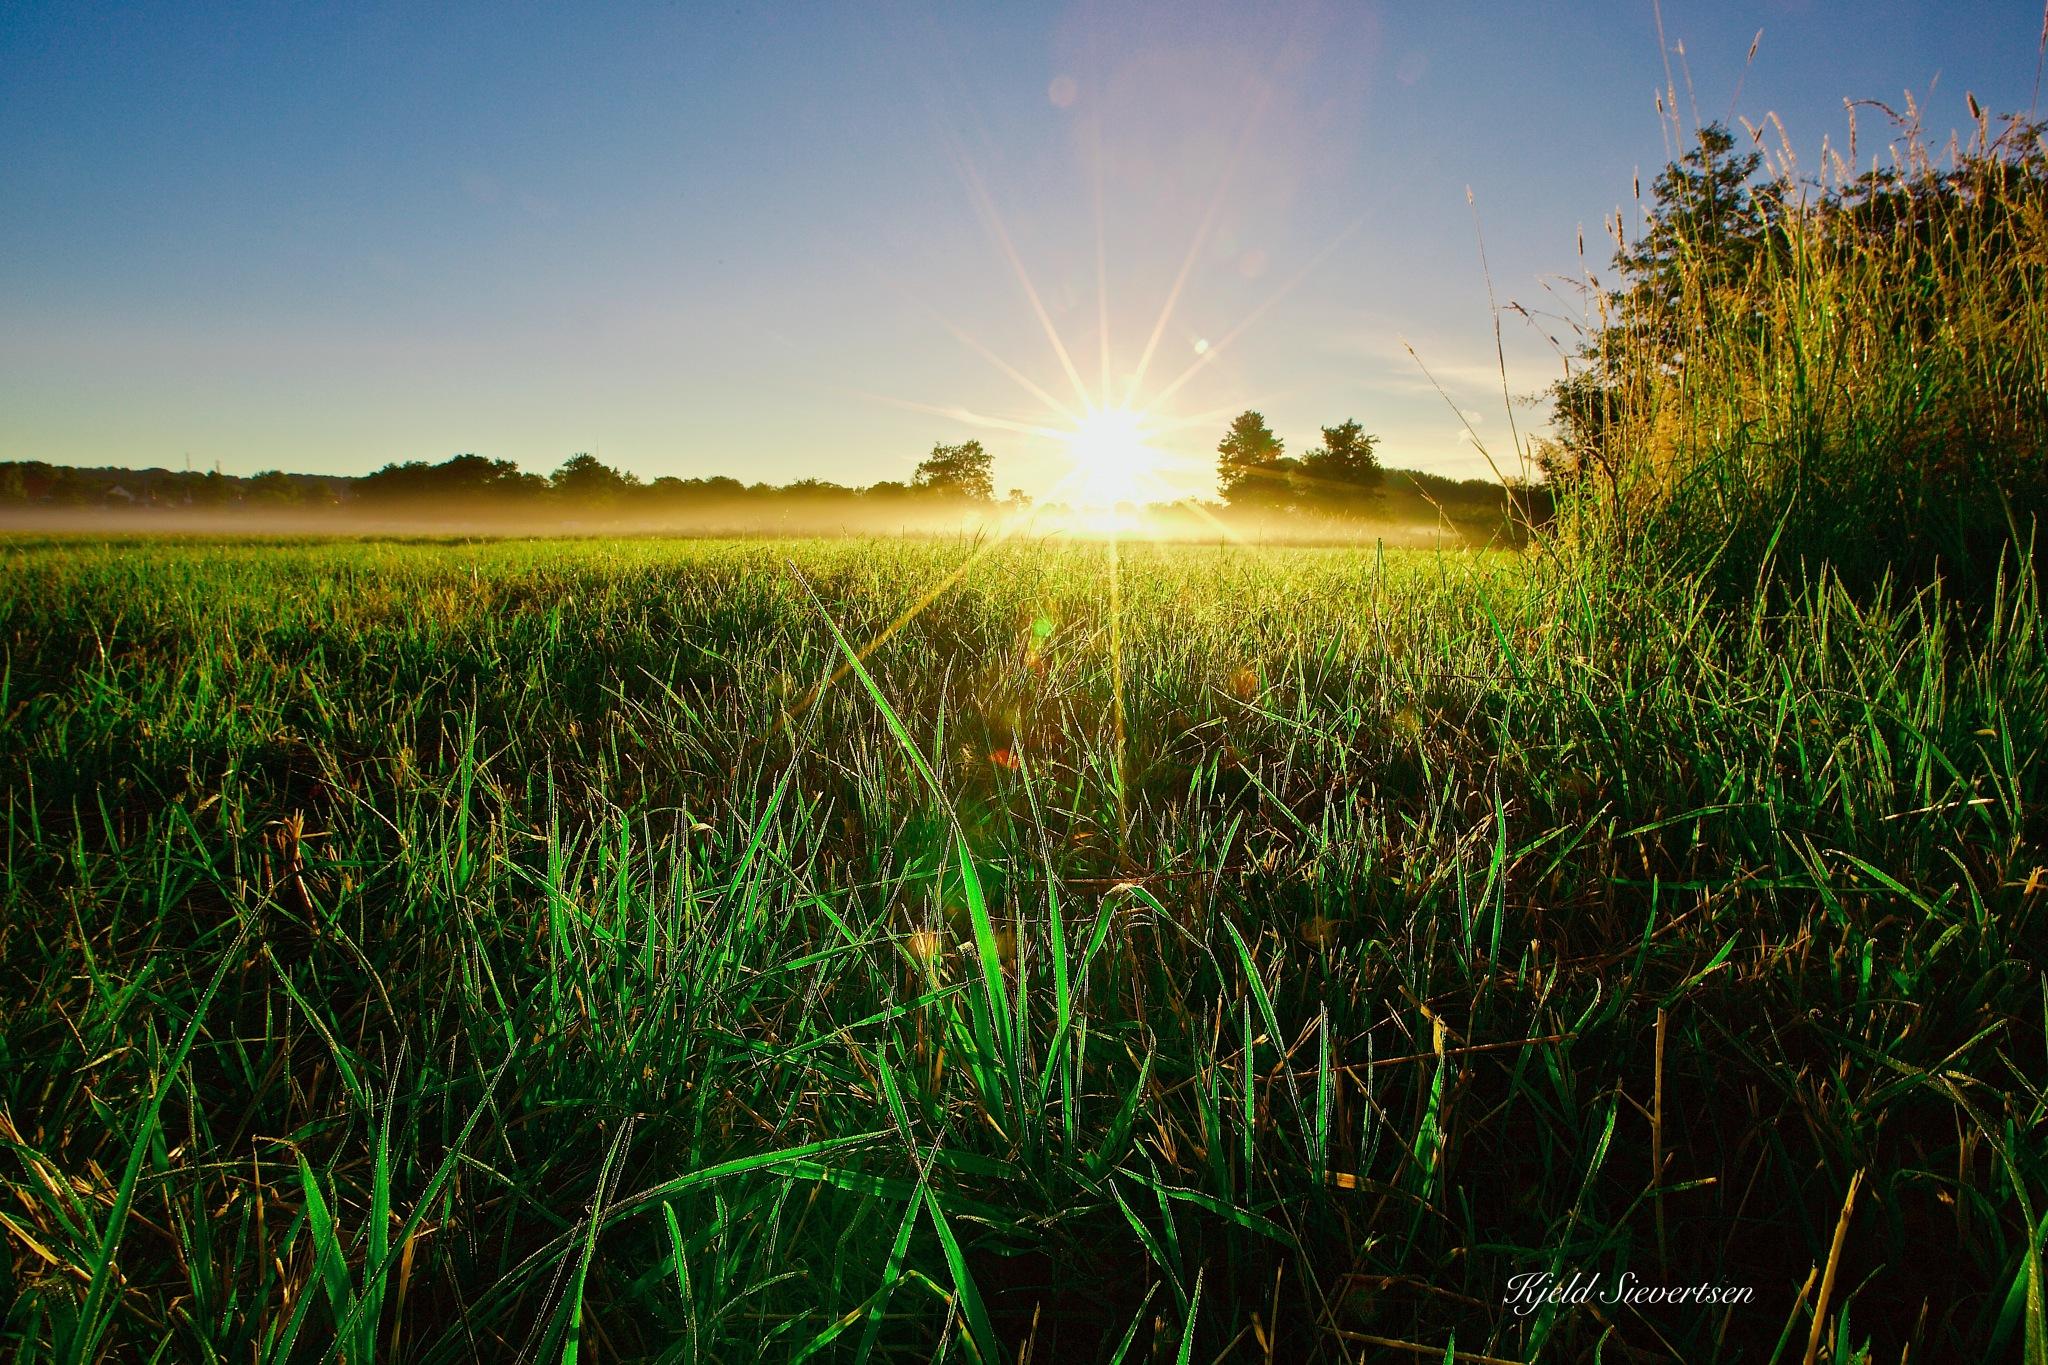 Sunrise.  by kjeld.sievertsen